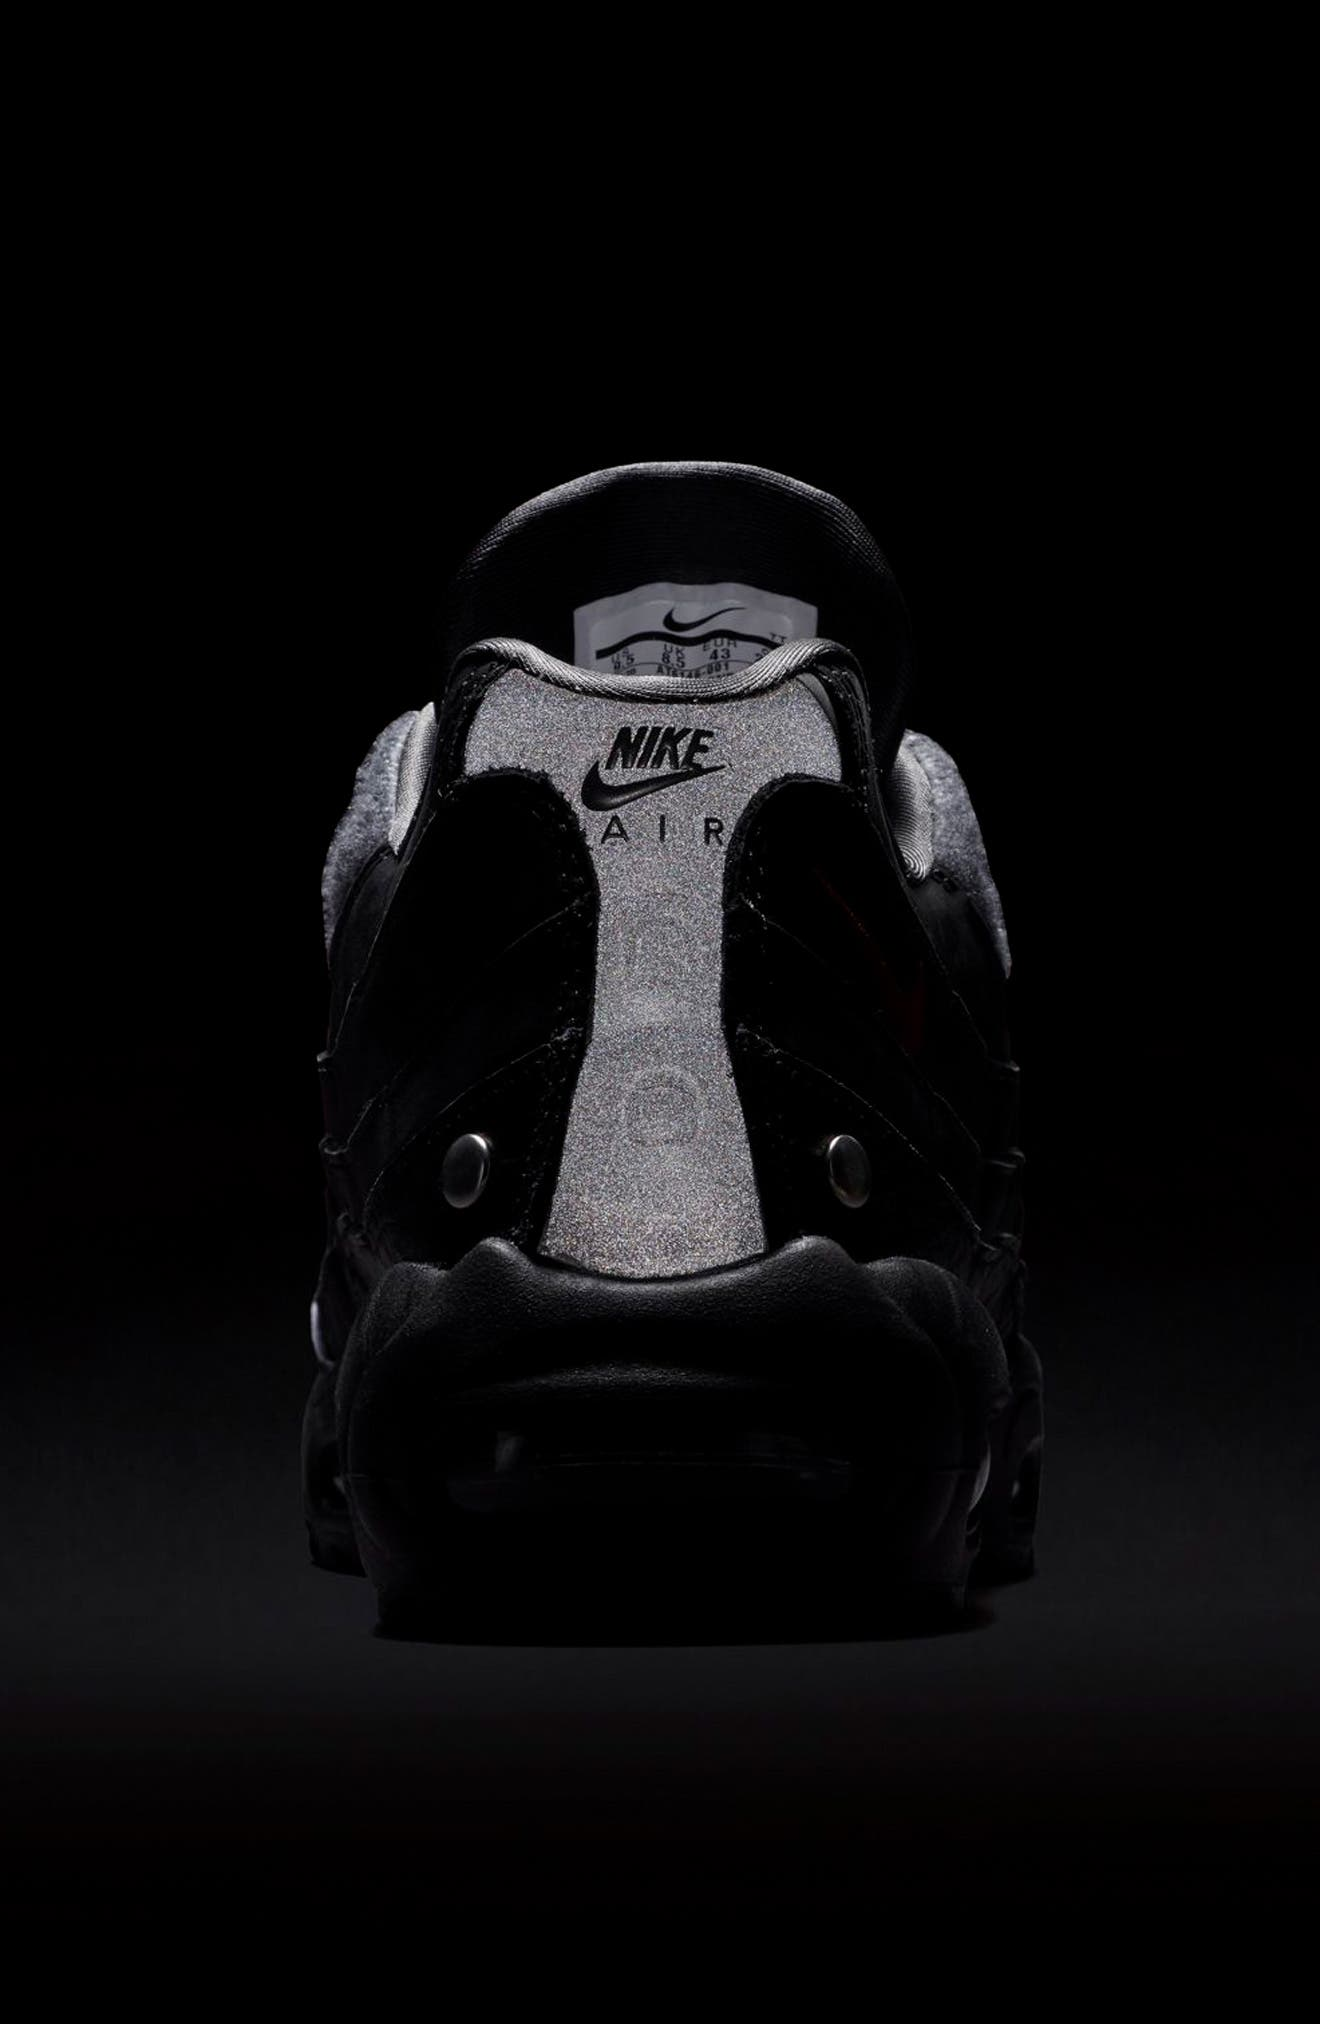 Air Max 95 NRG Sneaker,                             Alternate thumbnail 6, color,                             BLACK/ TEAM RED/ ANTHRACITE